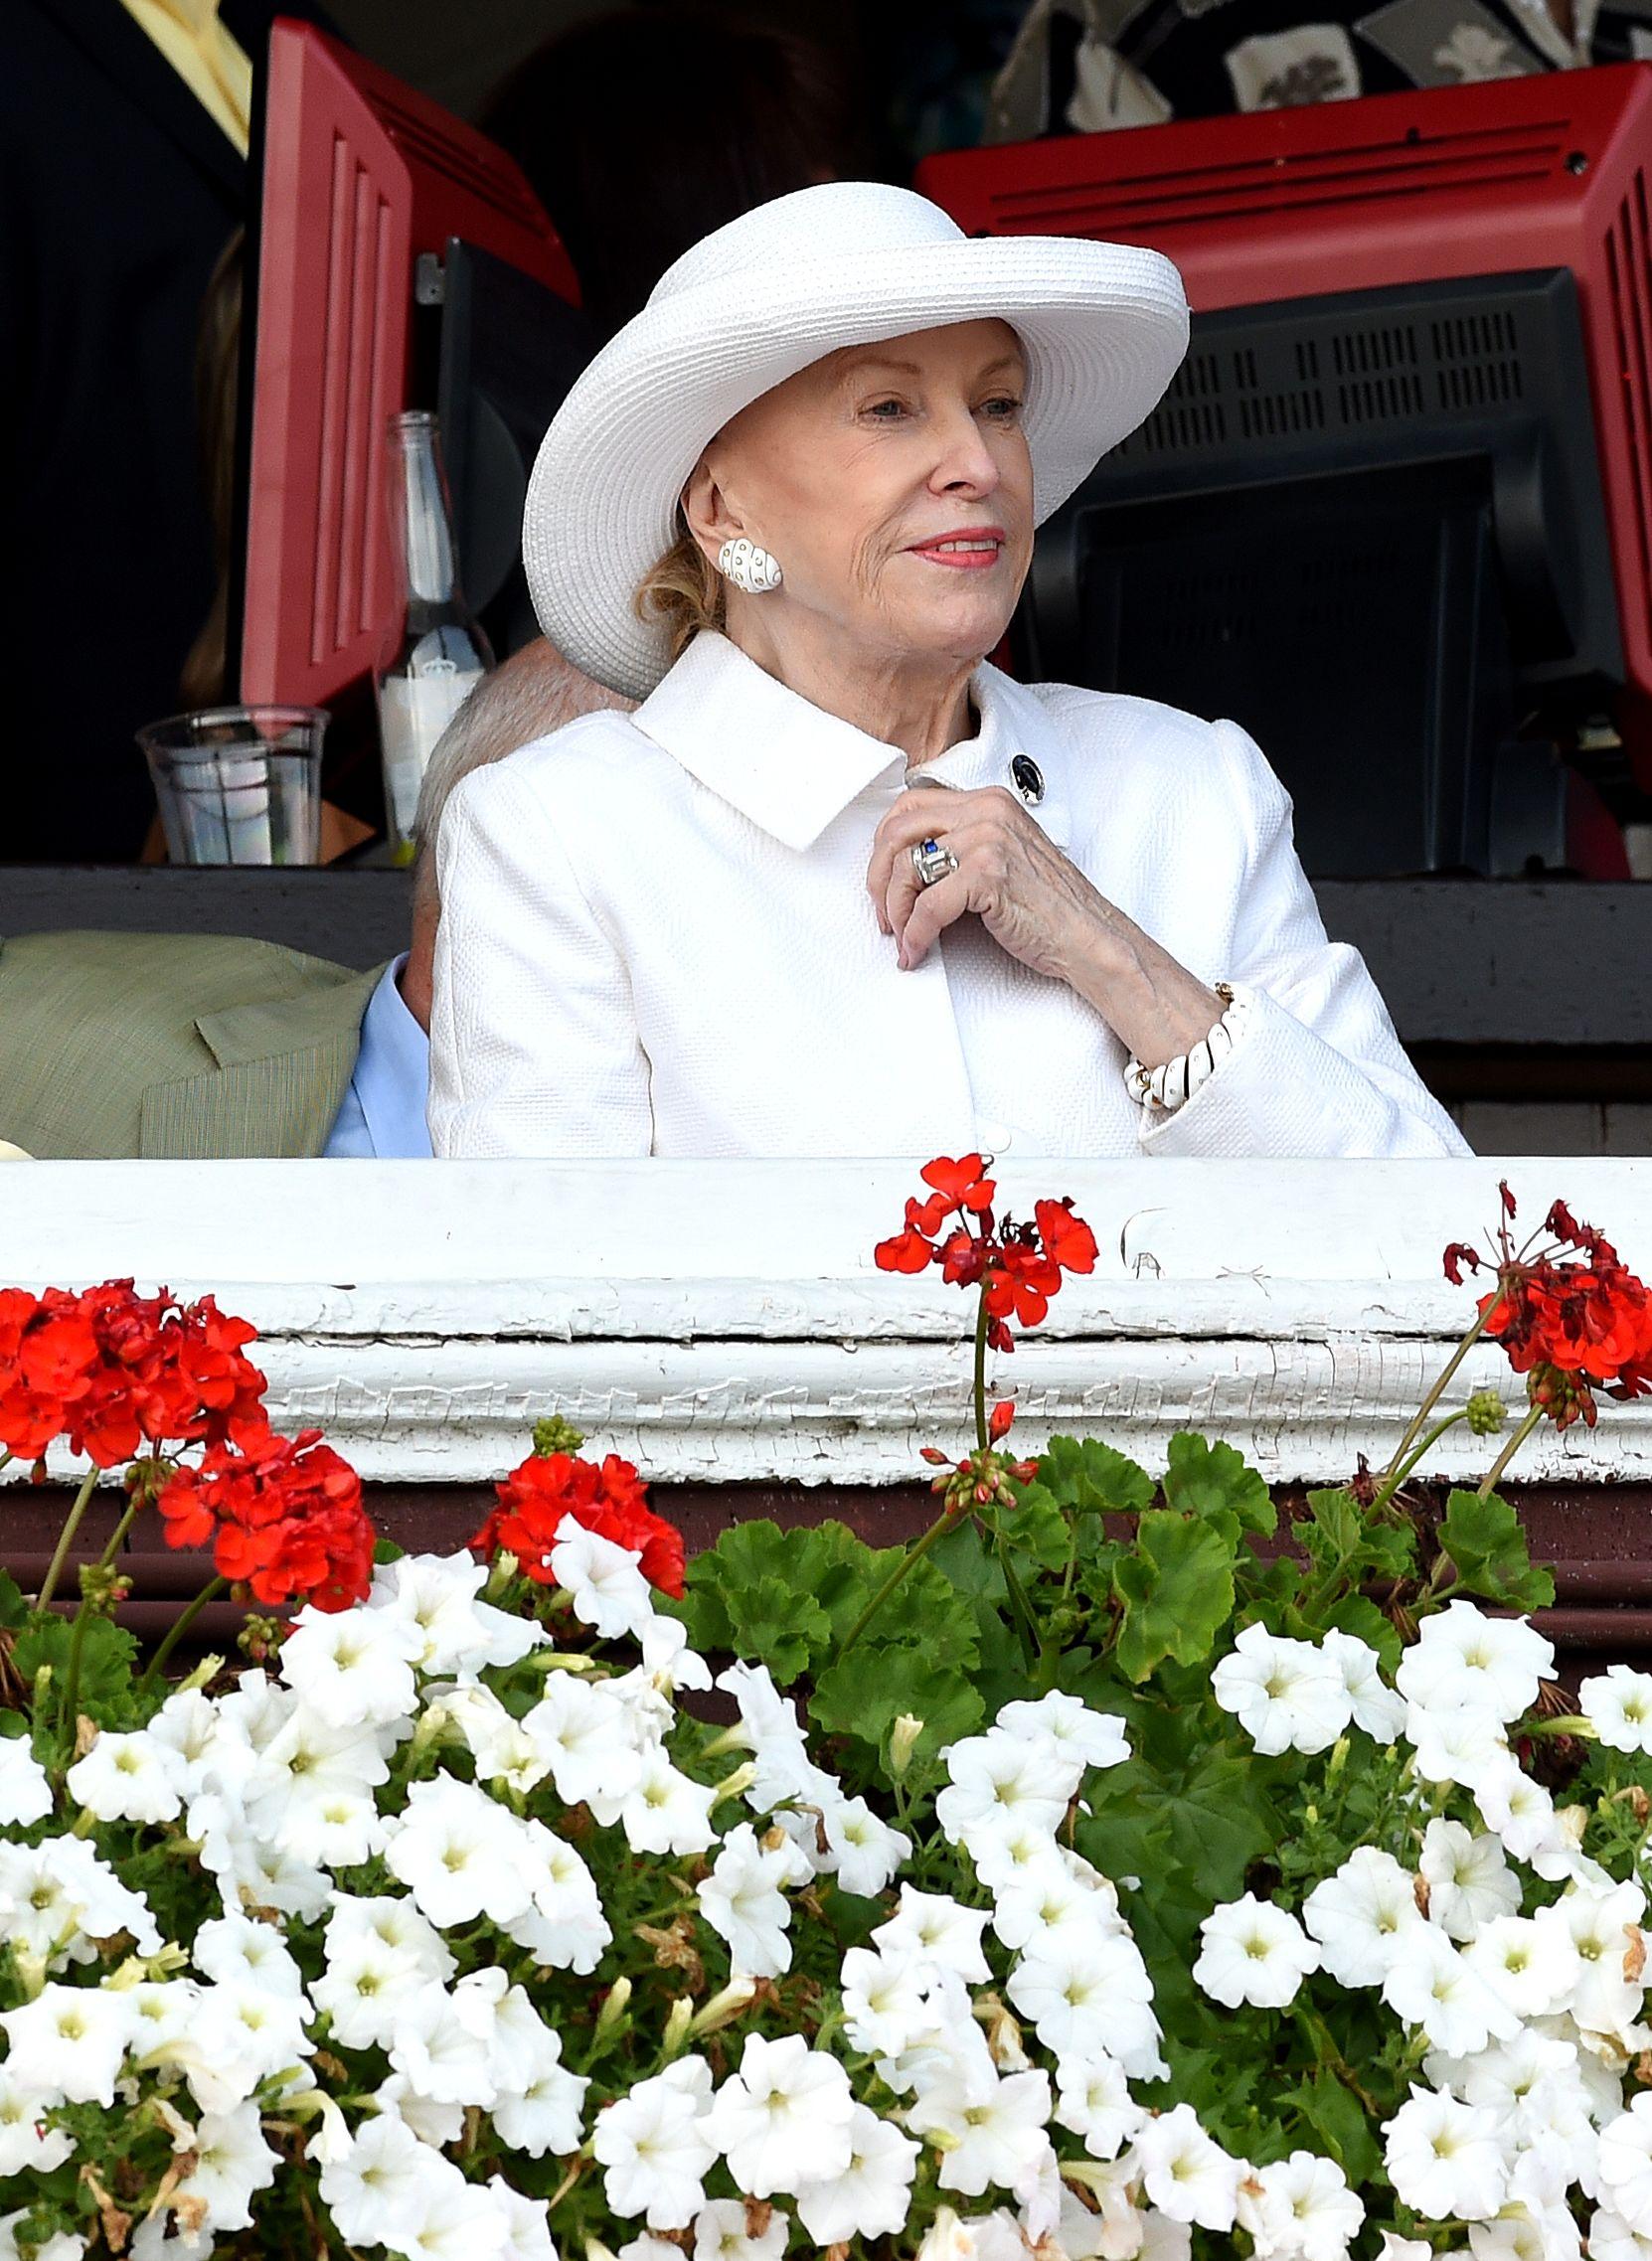 Marylou Whitney at Saratoga, 2014 (NYRA)